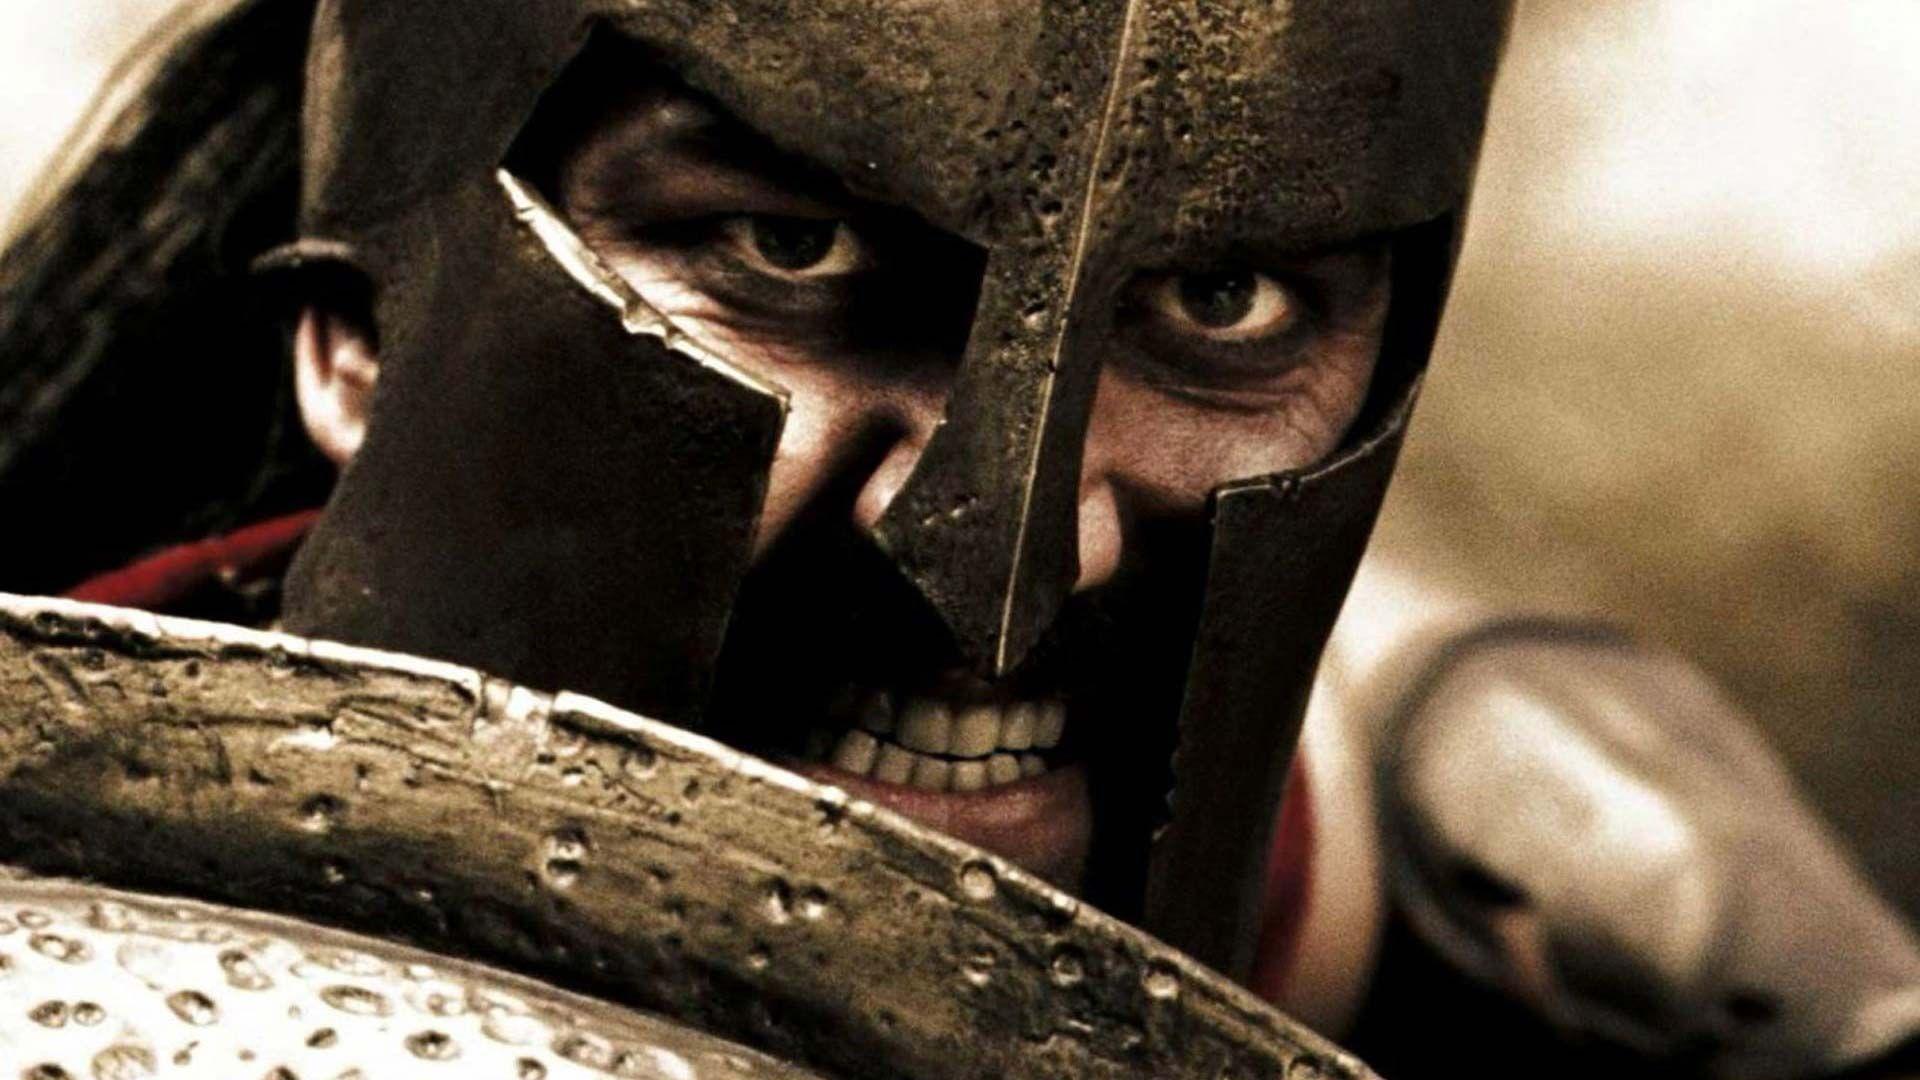 King Leonidas 300 Movie Wallpaper In 2019 300 Movie